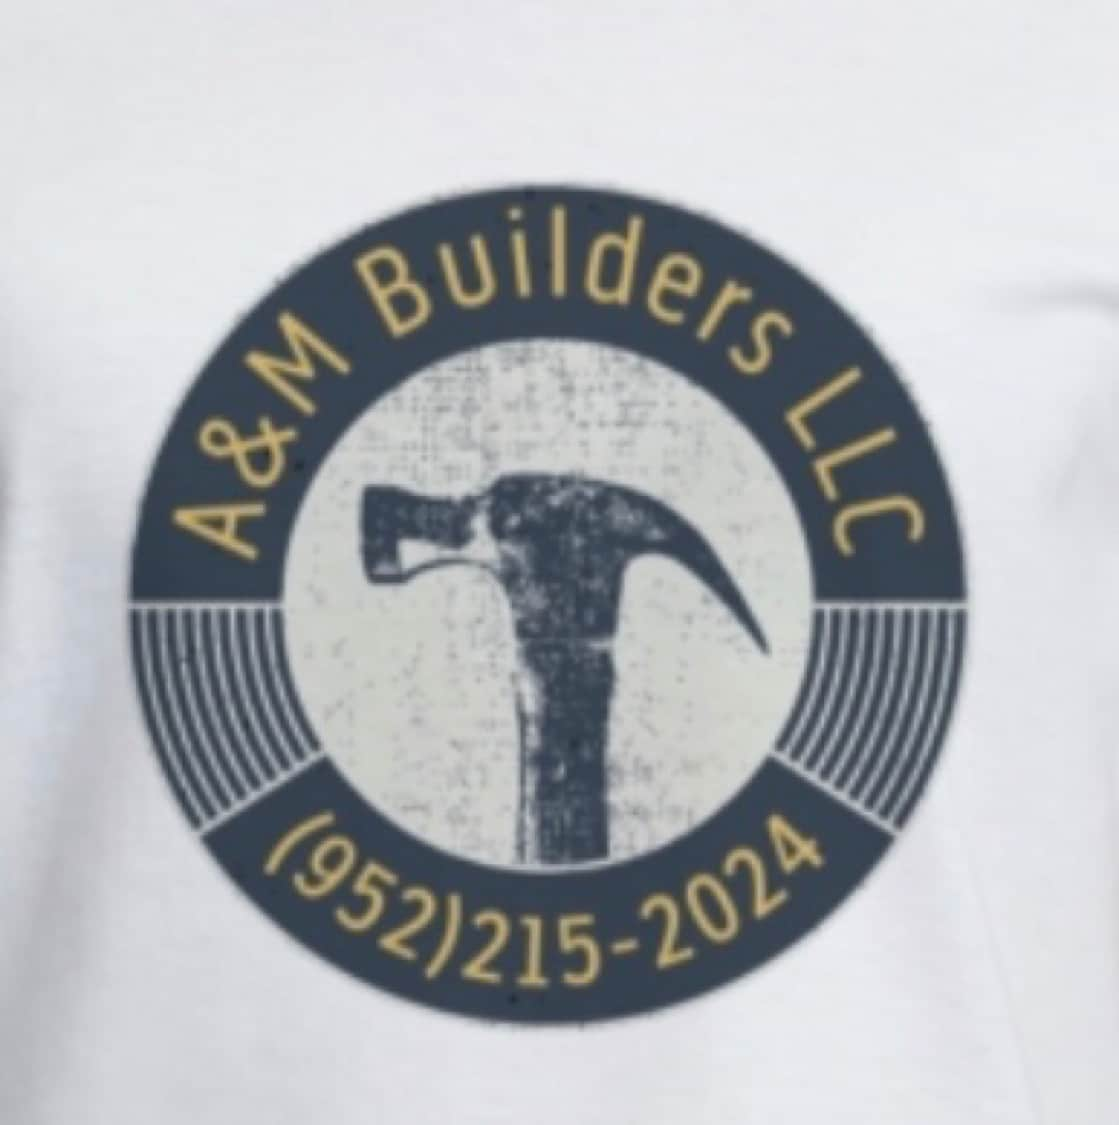 A&M Builders LLC logo